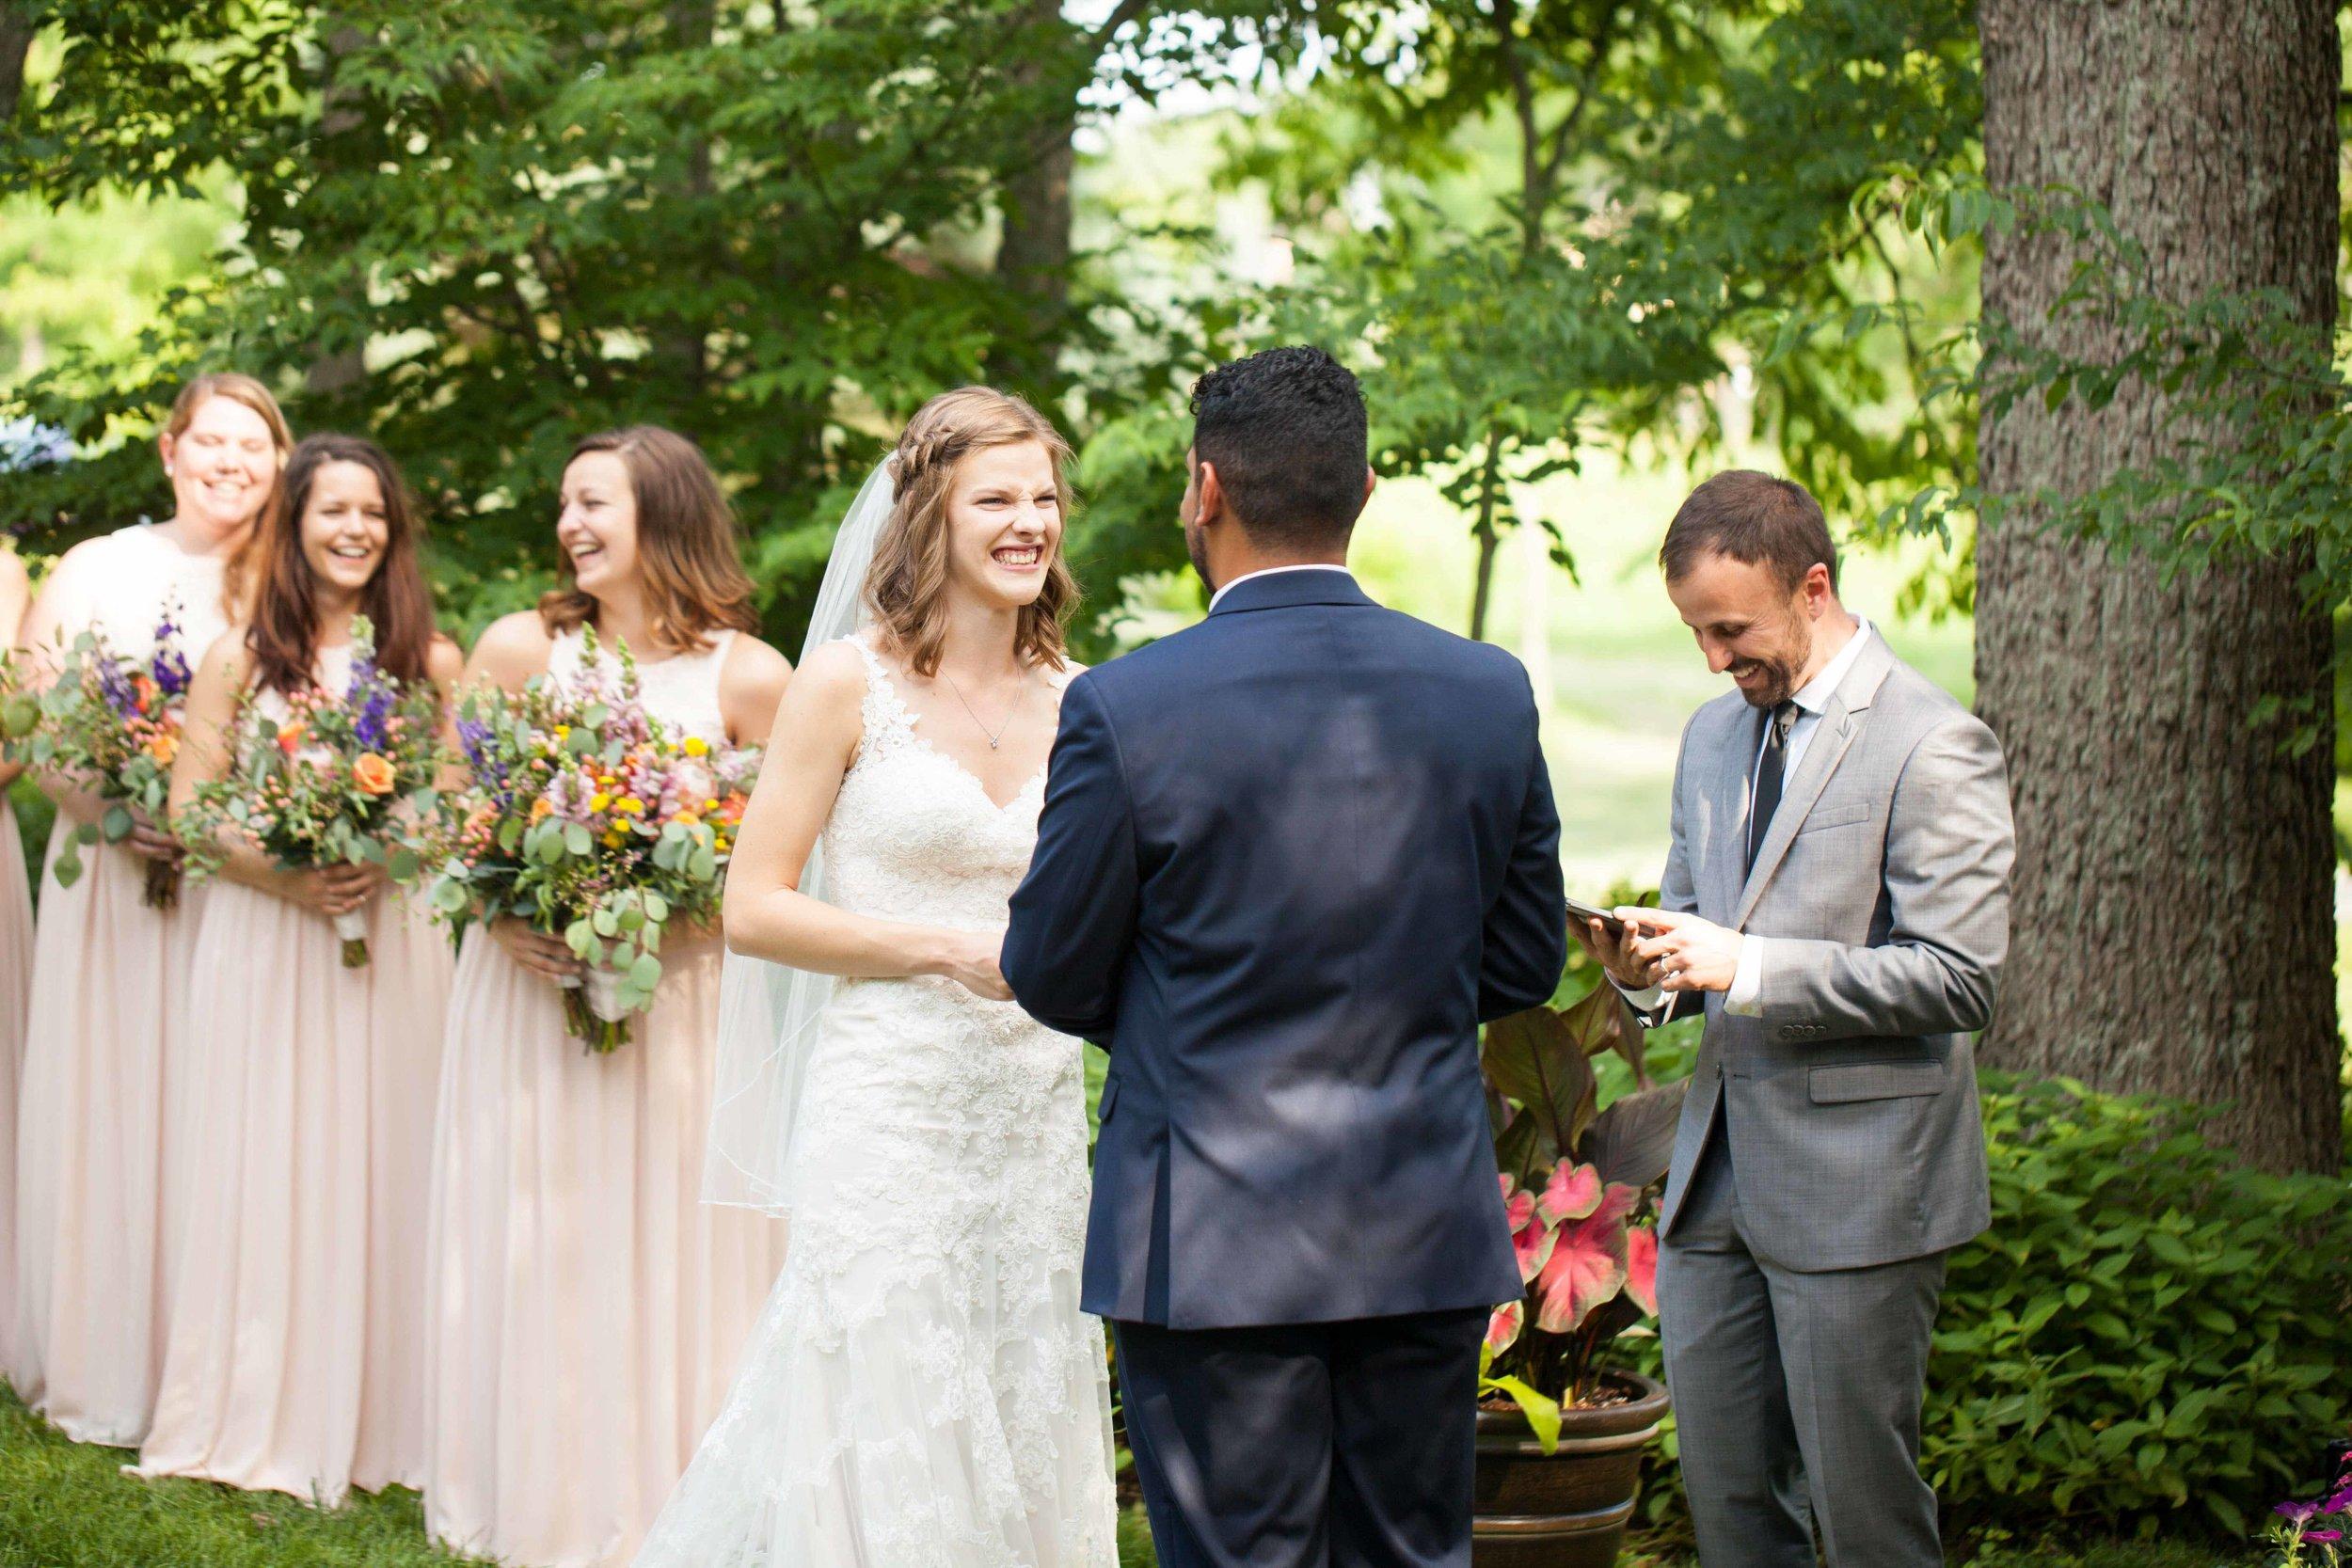 dd cincinnati wedding photographer ceremony0011.jpg